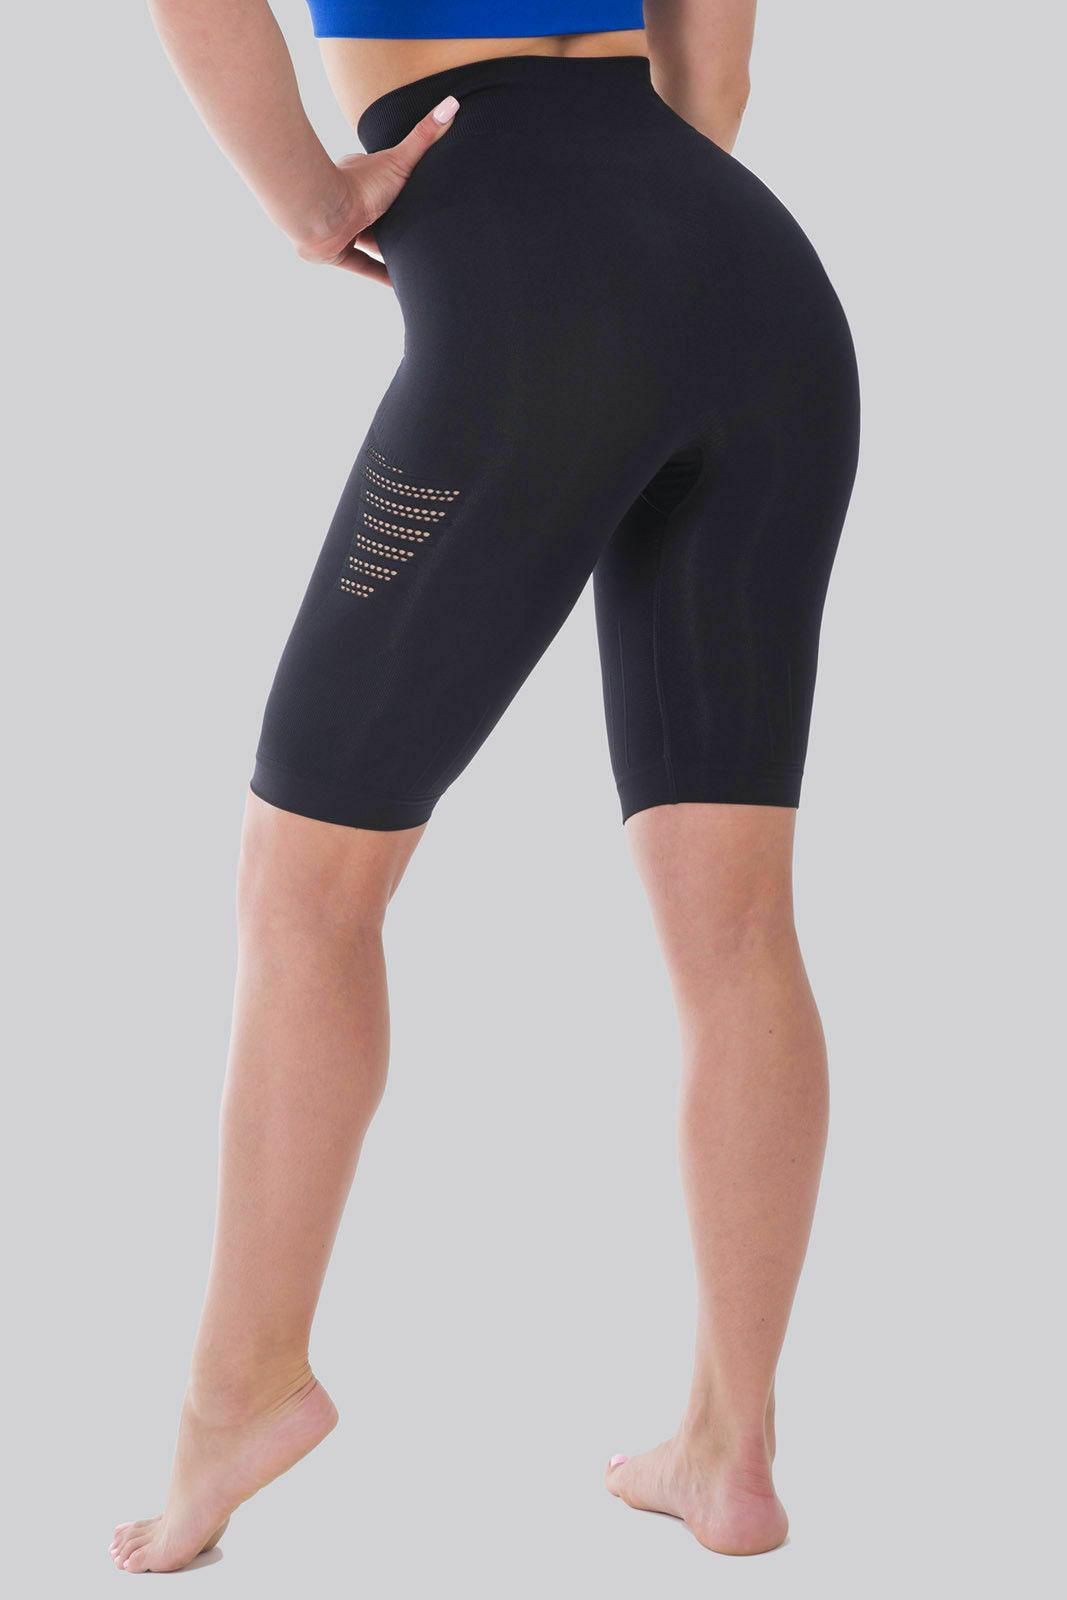 Bellissima-Women-039-s-Compression-Sport-Yoga-Shorts-High-Waist-Workout-Running thumbnail 11